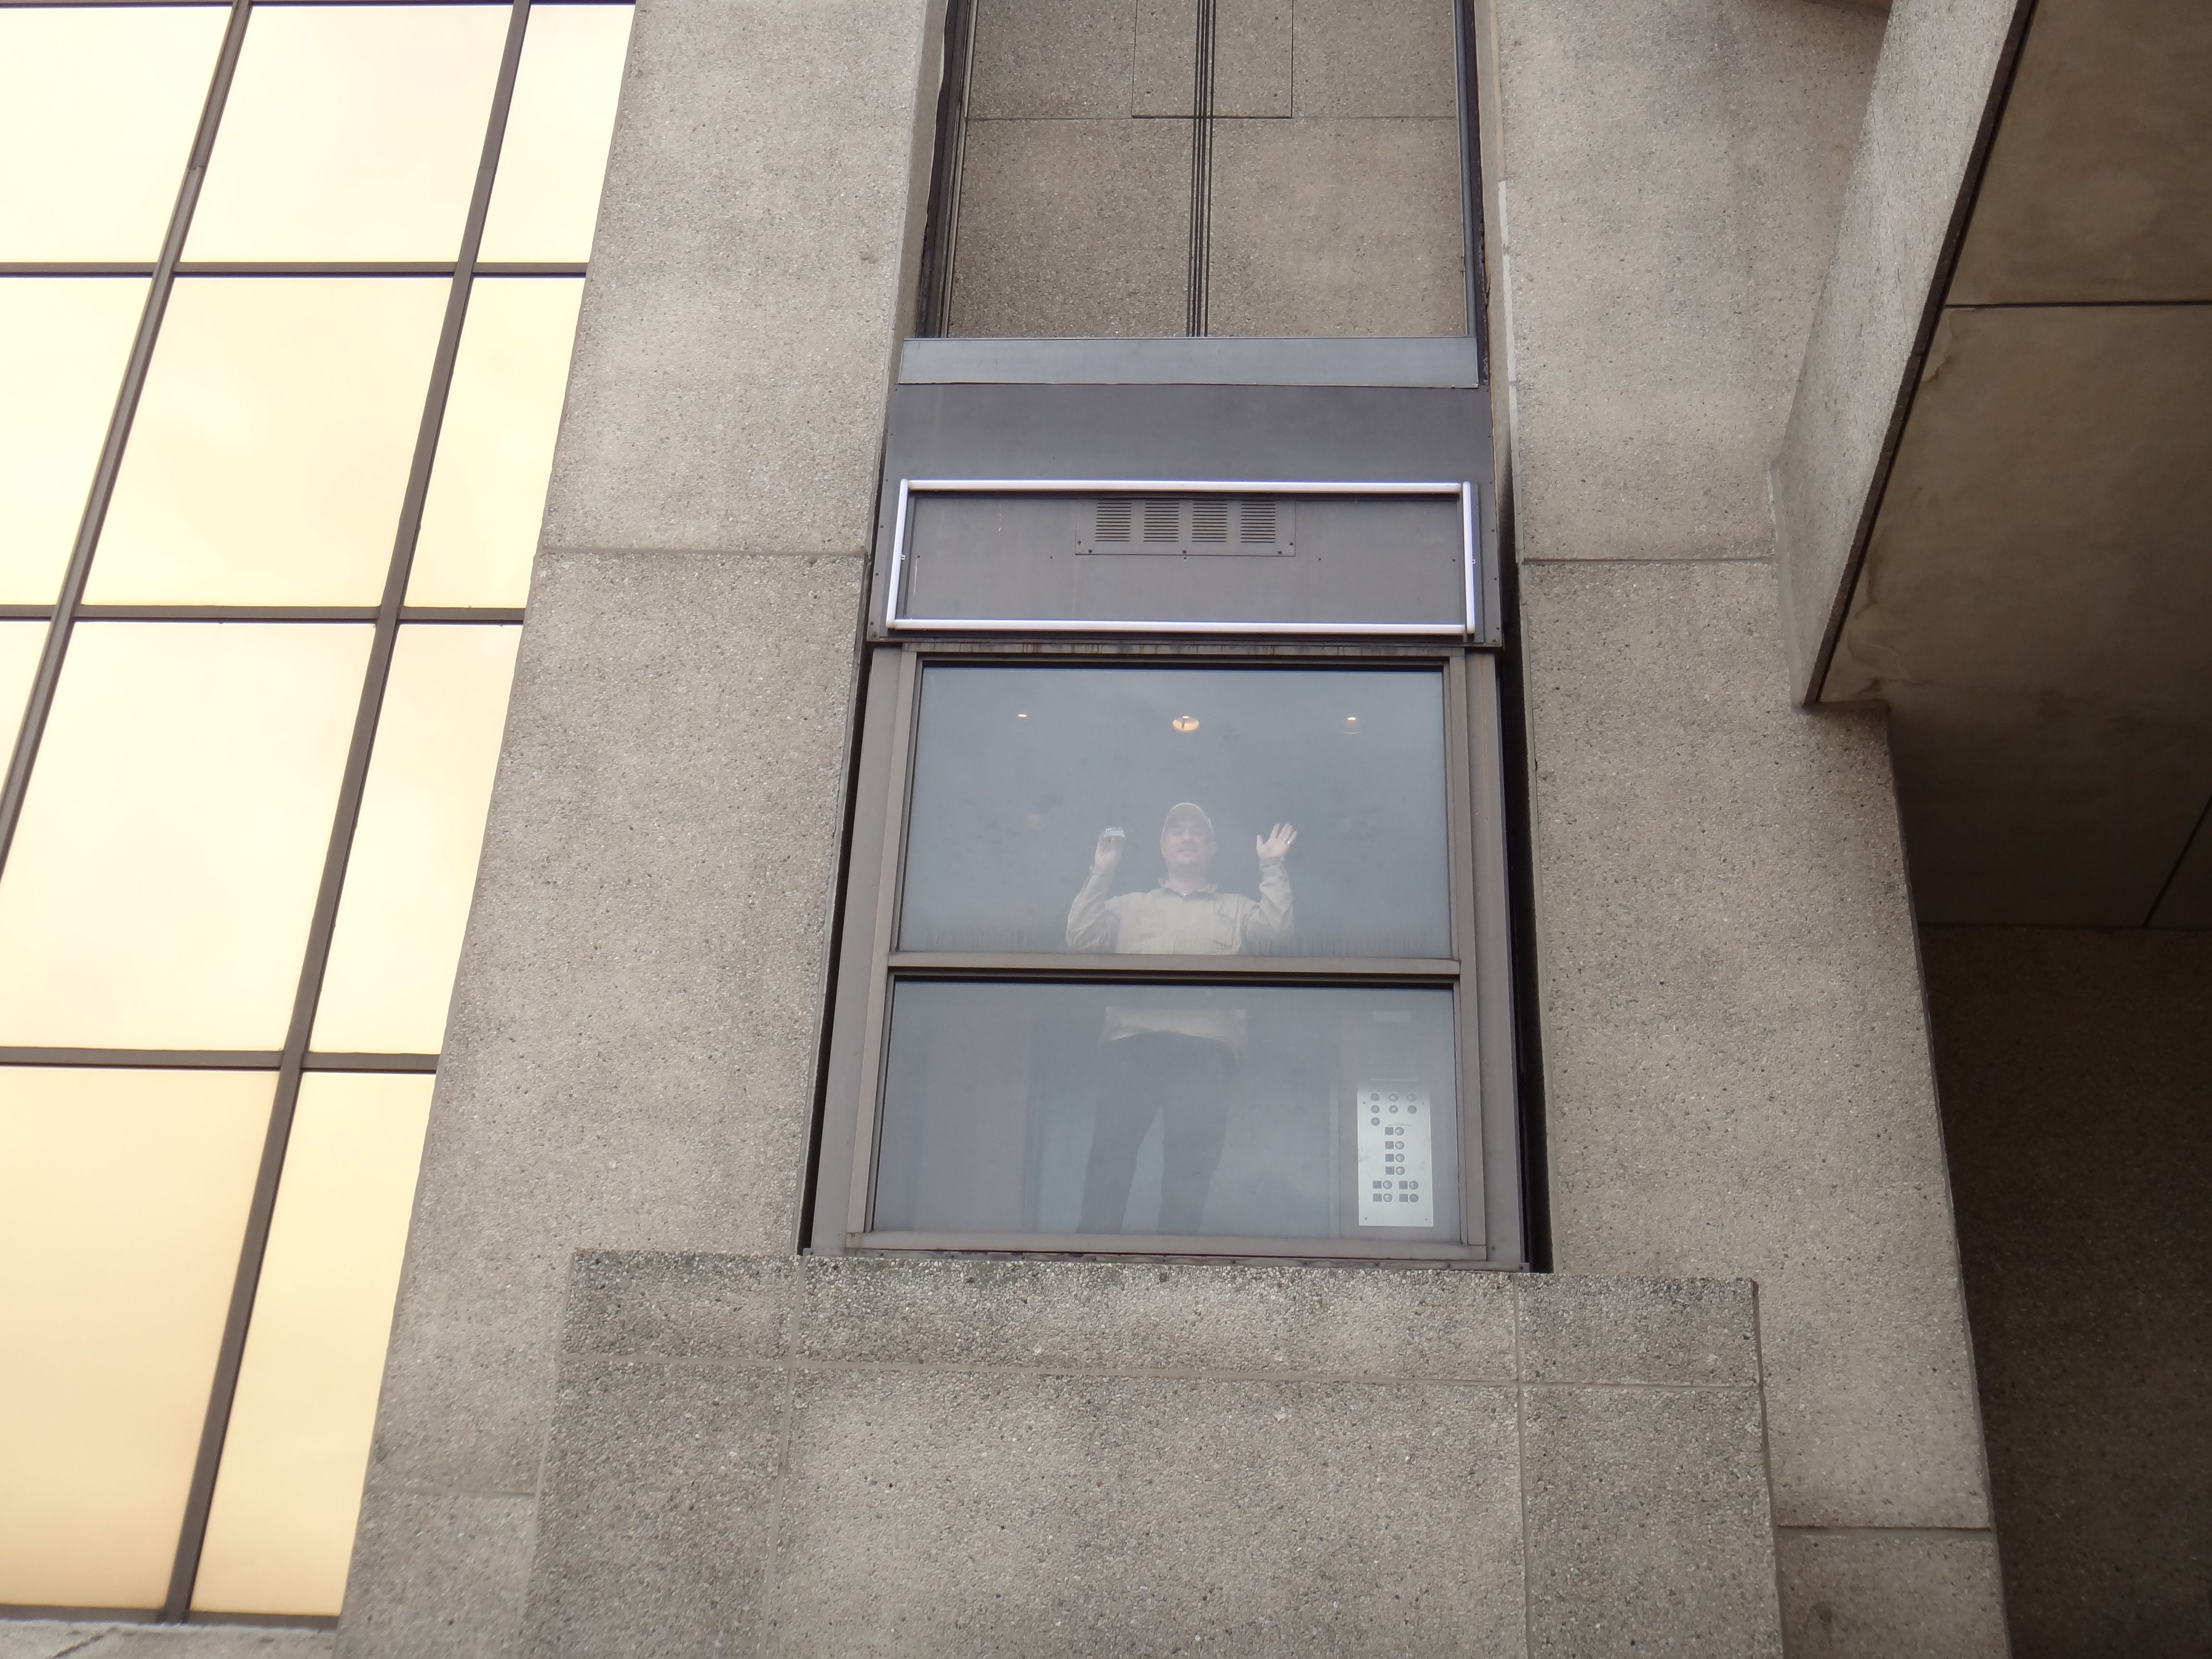 Electrical Design: Elevator Electrical Design